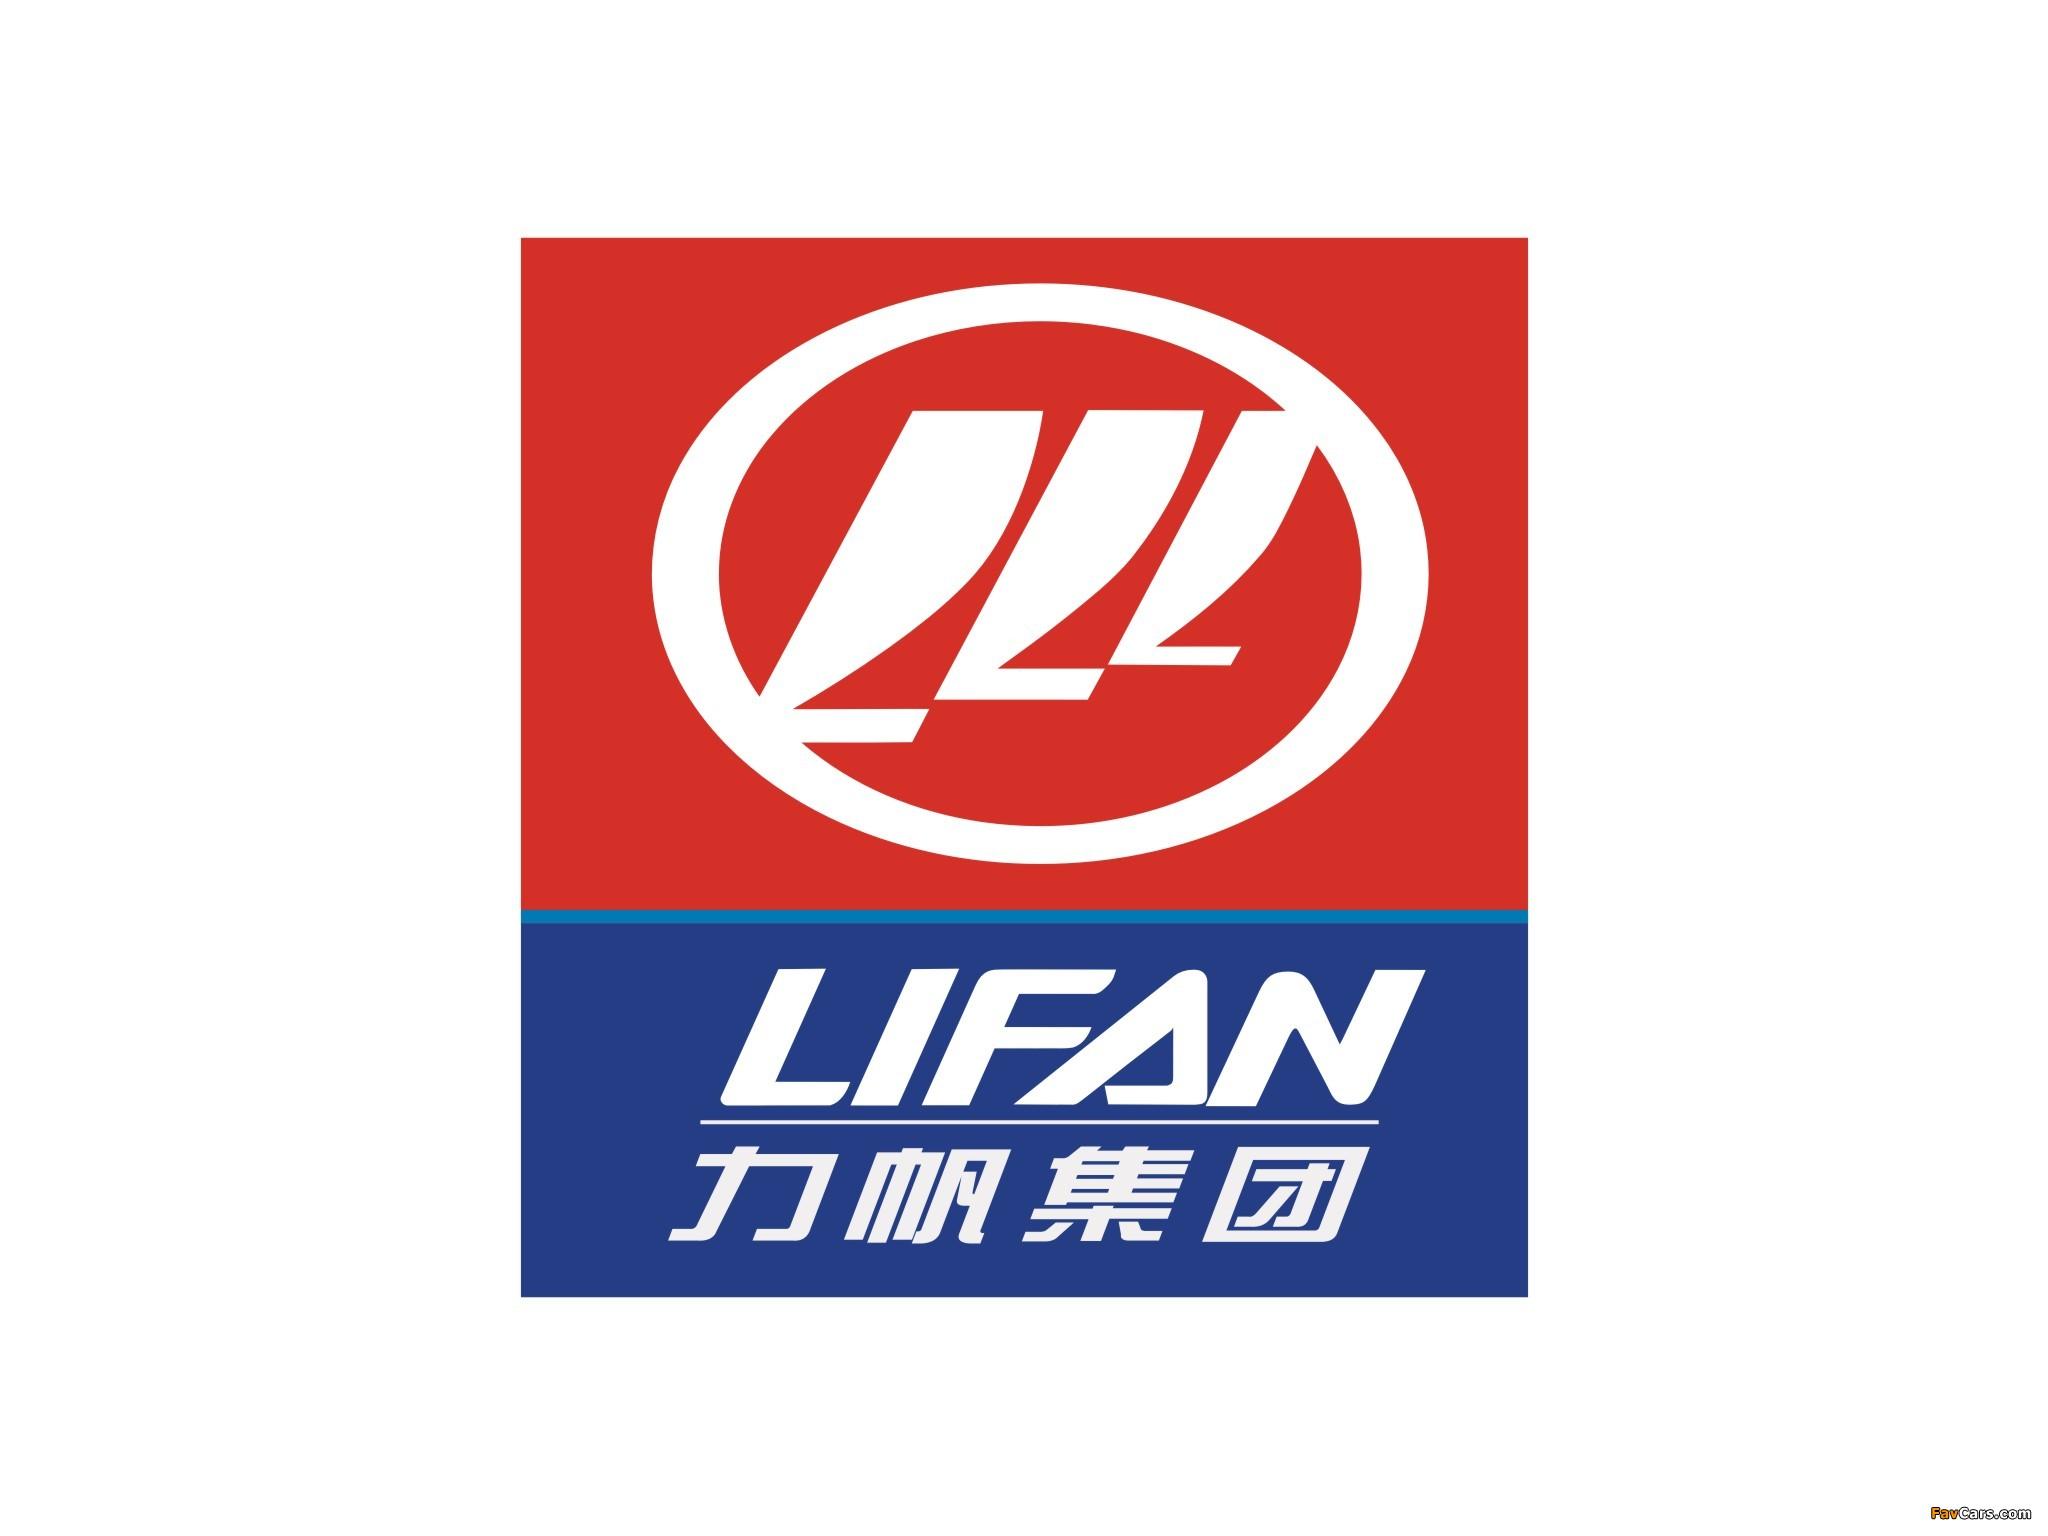 Lifan photos (2048 x 1536)